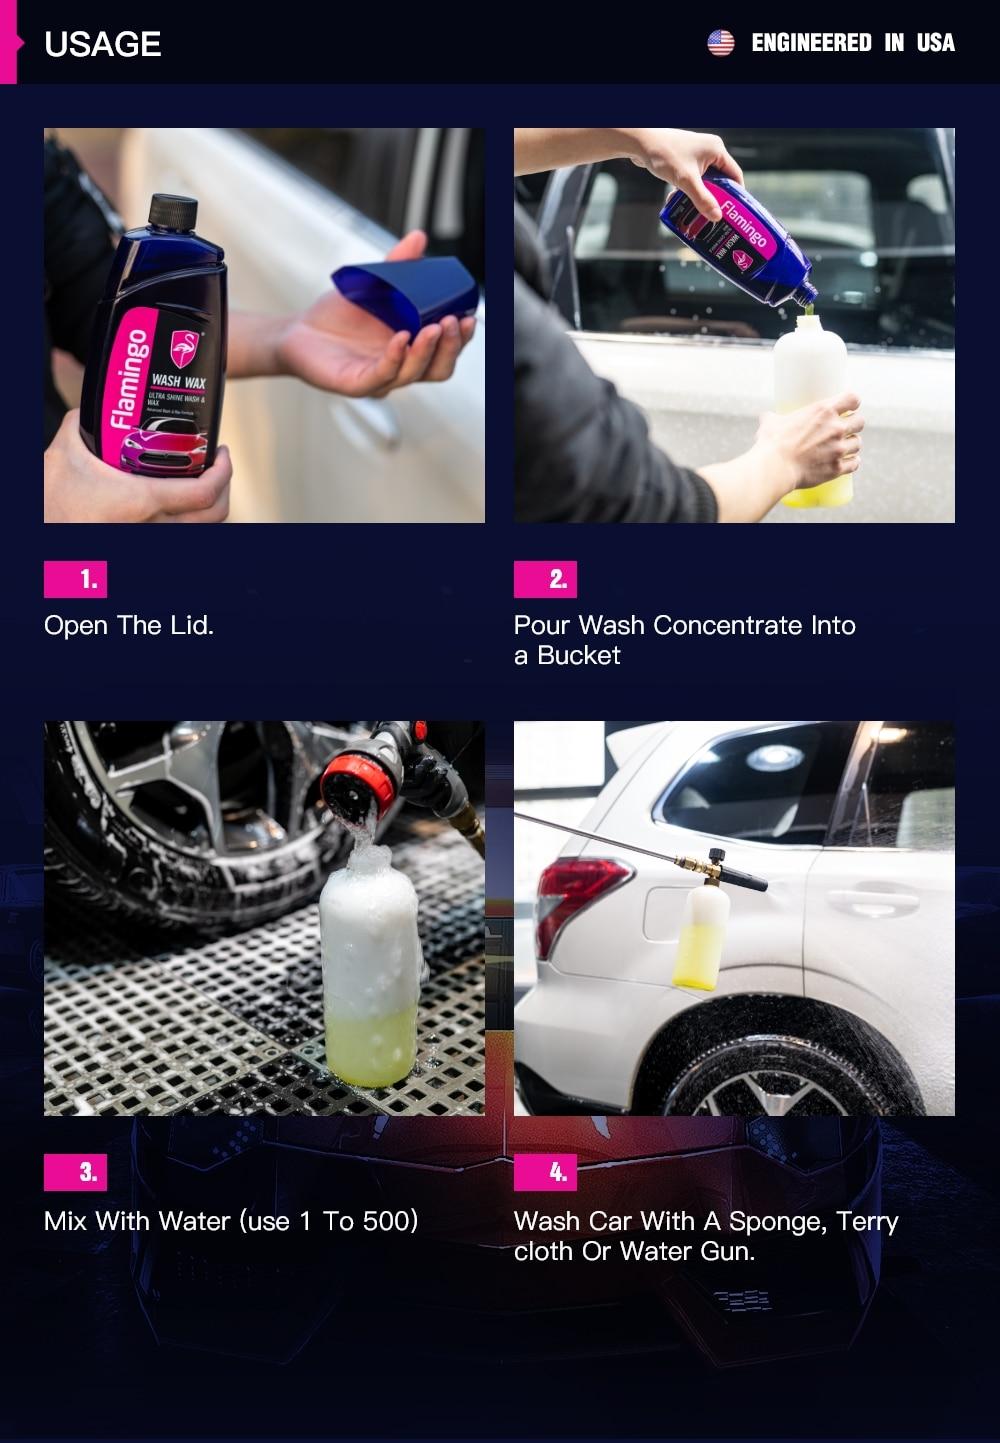 500ml Premium Car Wash Wax Cleaning Product Paint Auto Care Scratch Repair  Detailing Supplies 17 64Oz